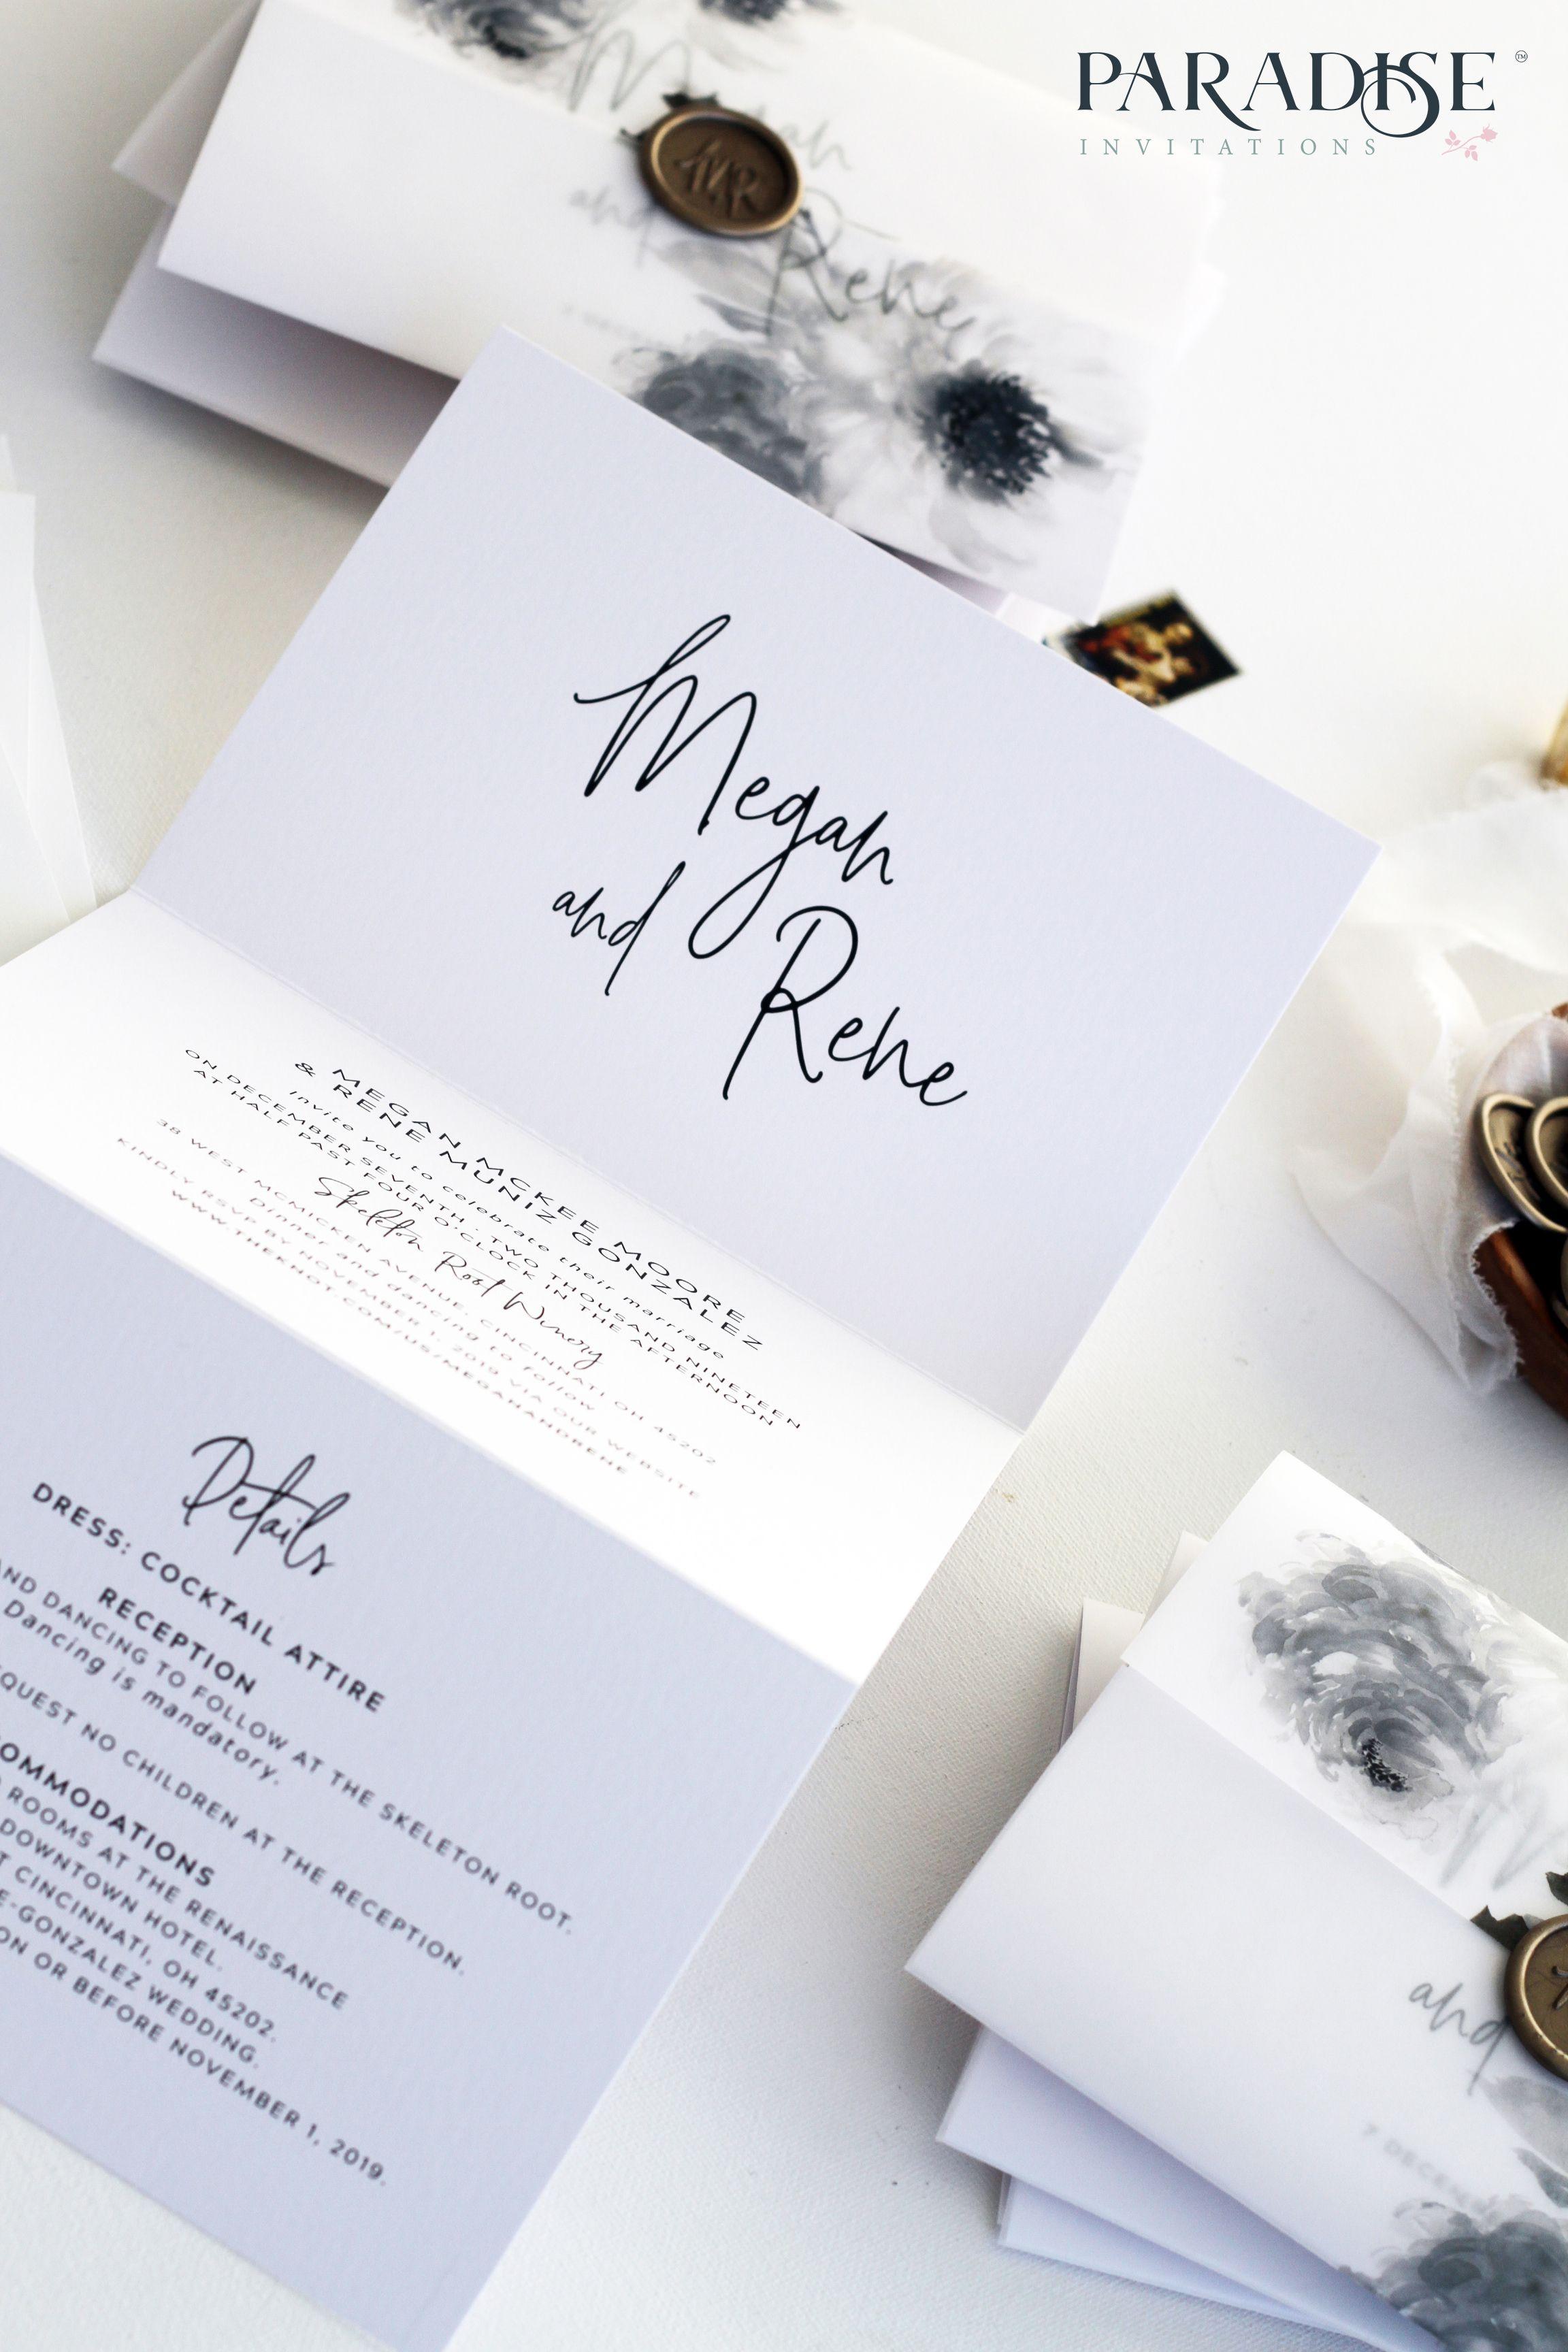 Weddinginvitation Weddinginvitations Weddinginvite Weddinginvi Free Wedding Invitation Samples Wedding Invitations Australia Custom Wedding Cards